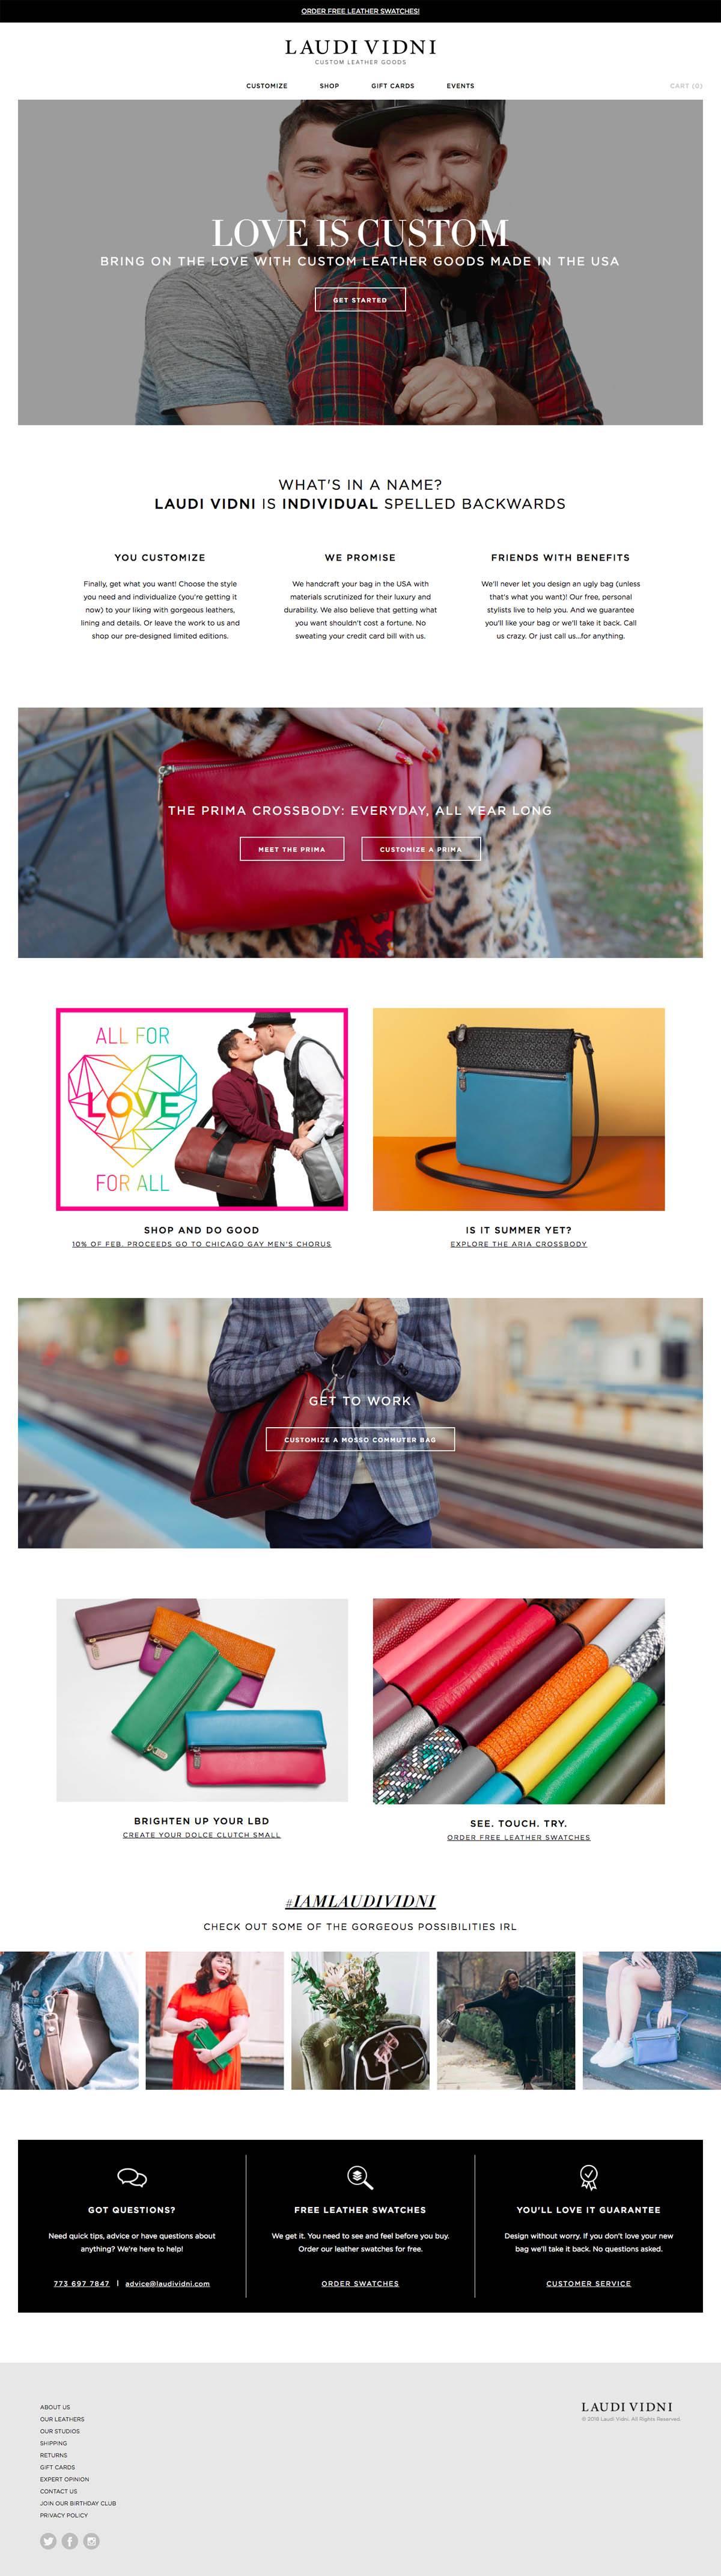 eCommerce website: Laudi Vidni